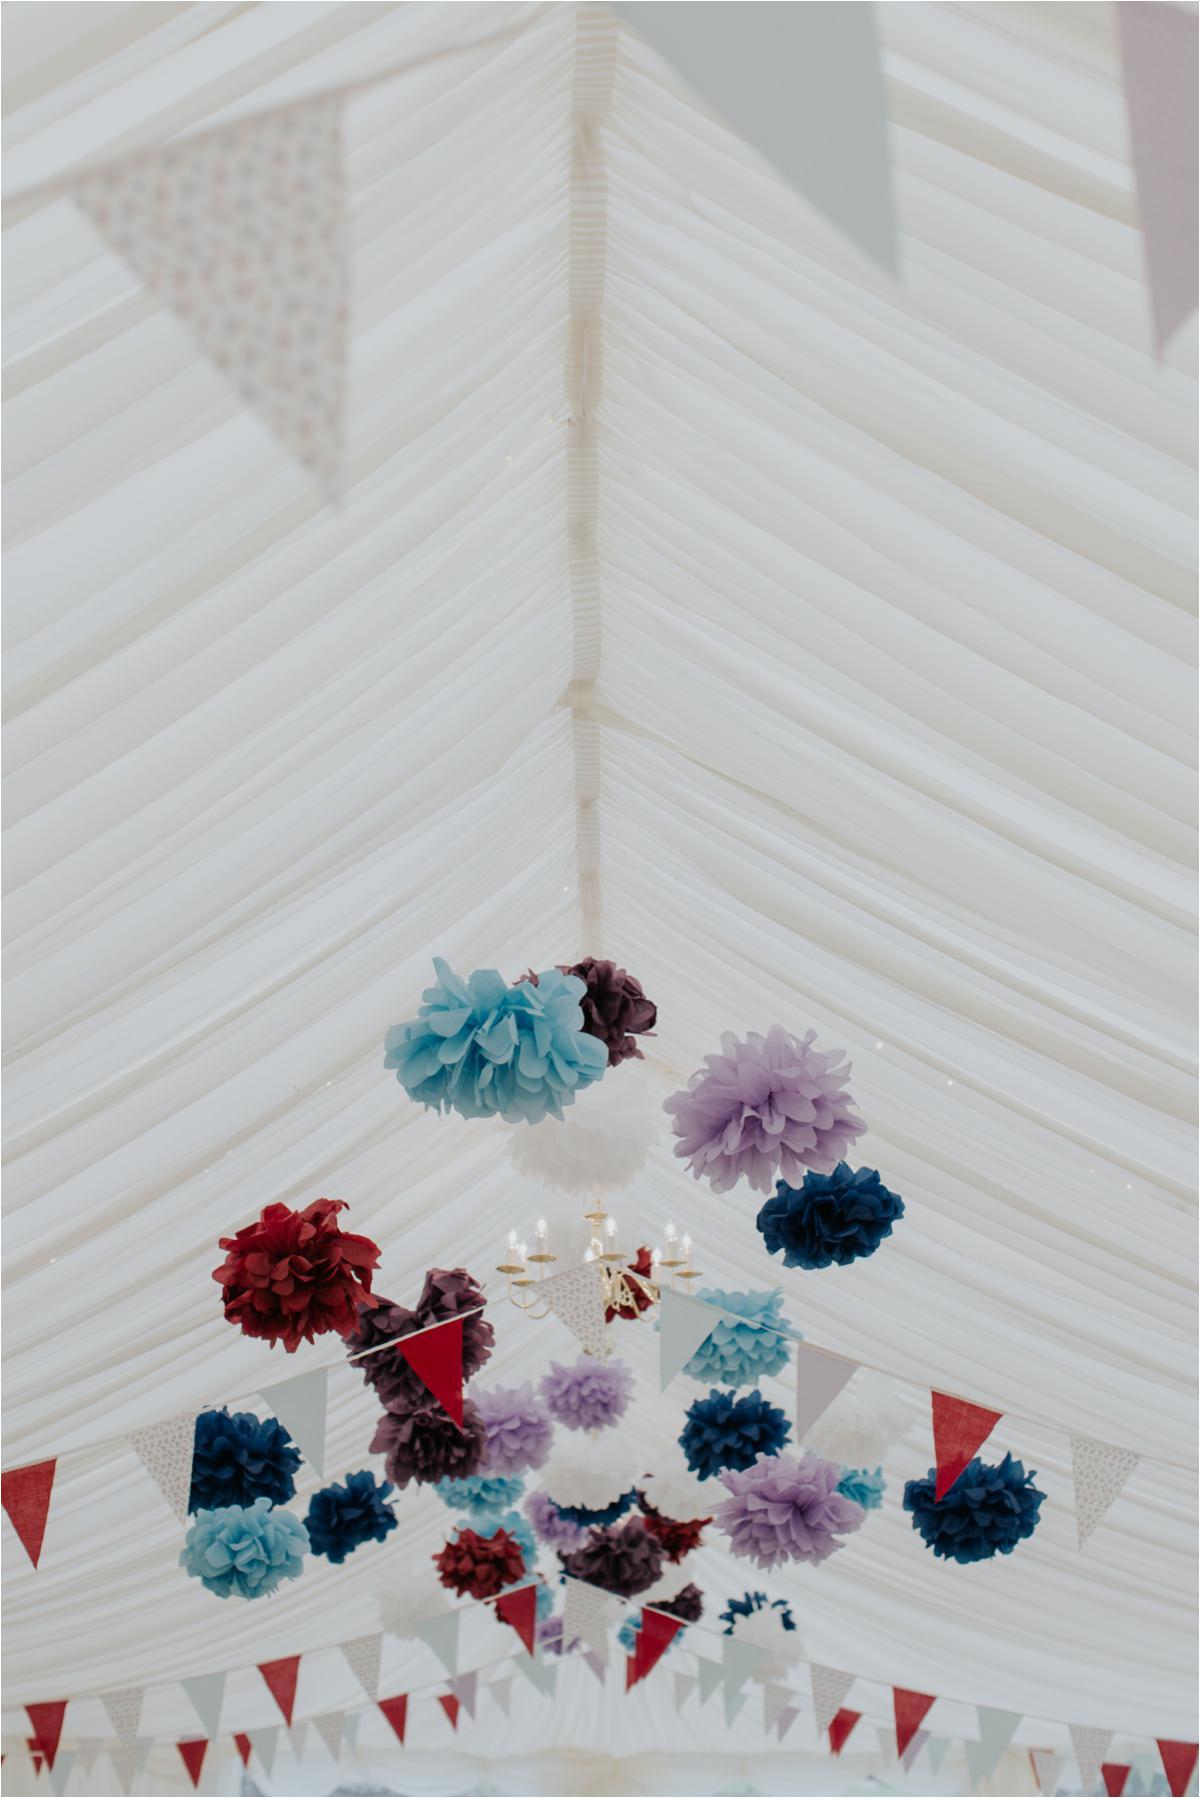 Photography 78 - Glasgow Wedding Photographer -Jonathan & Corrie's Garden Wedding in Aberfeldy - Dunkeld Cathedral_0089.jpg